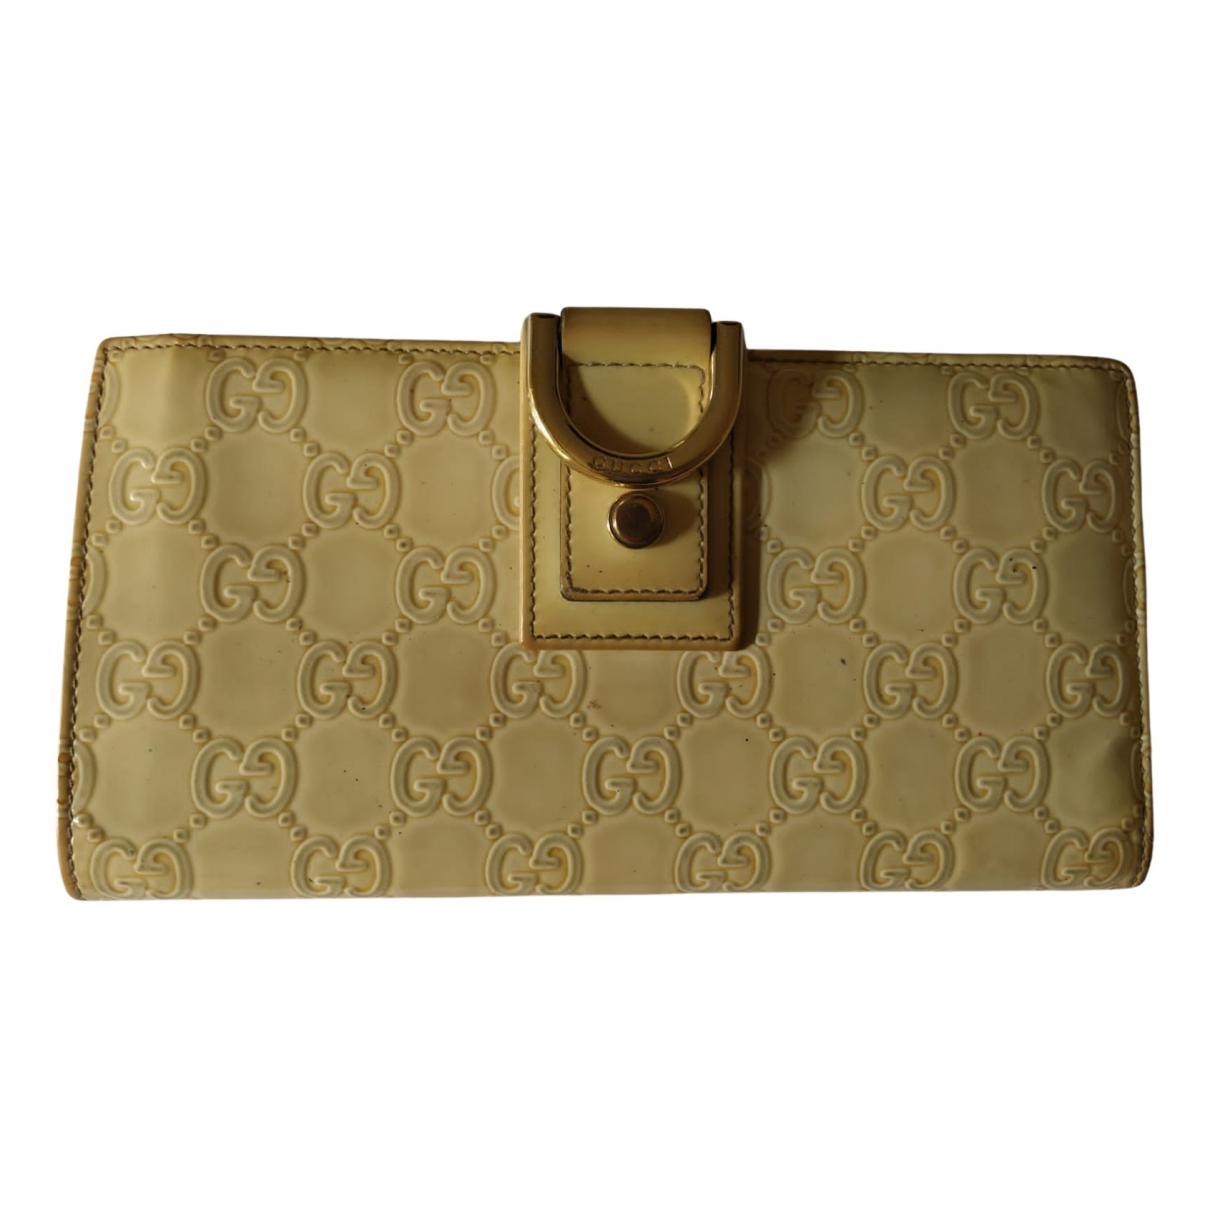 Gucci \N Portemonnaie in  Ecru Lackleder